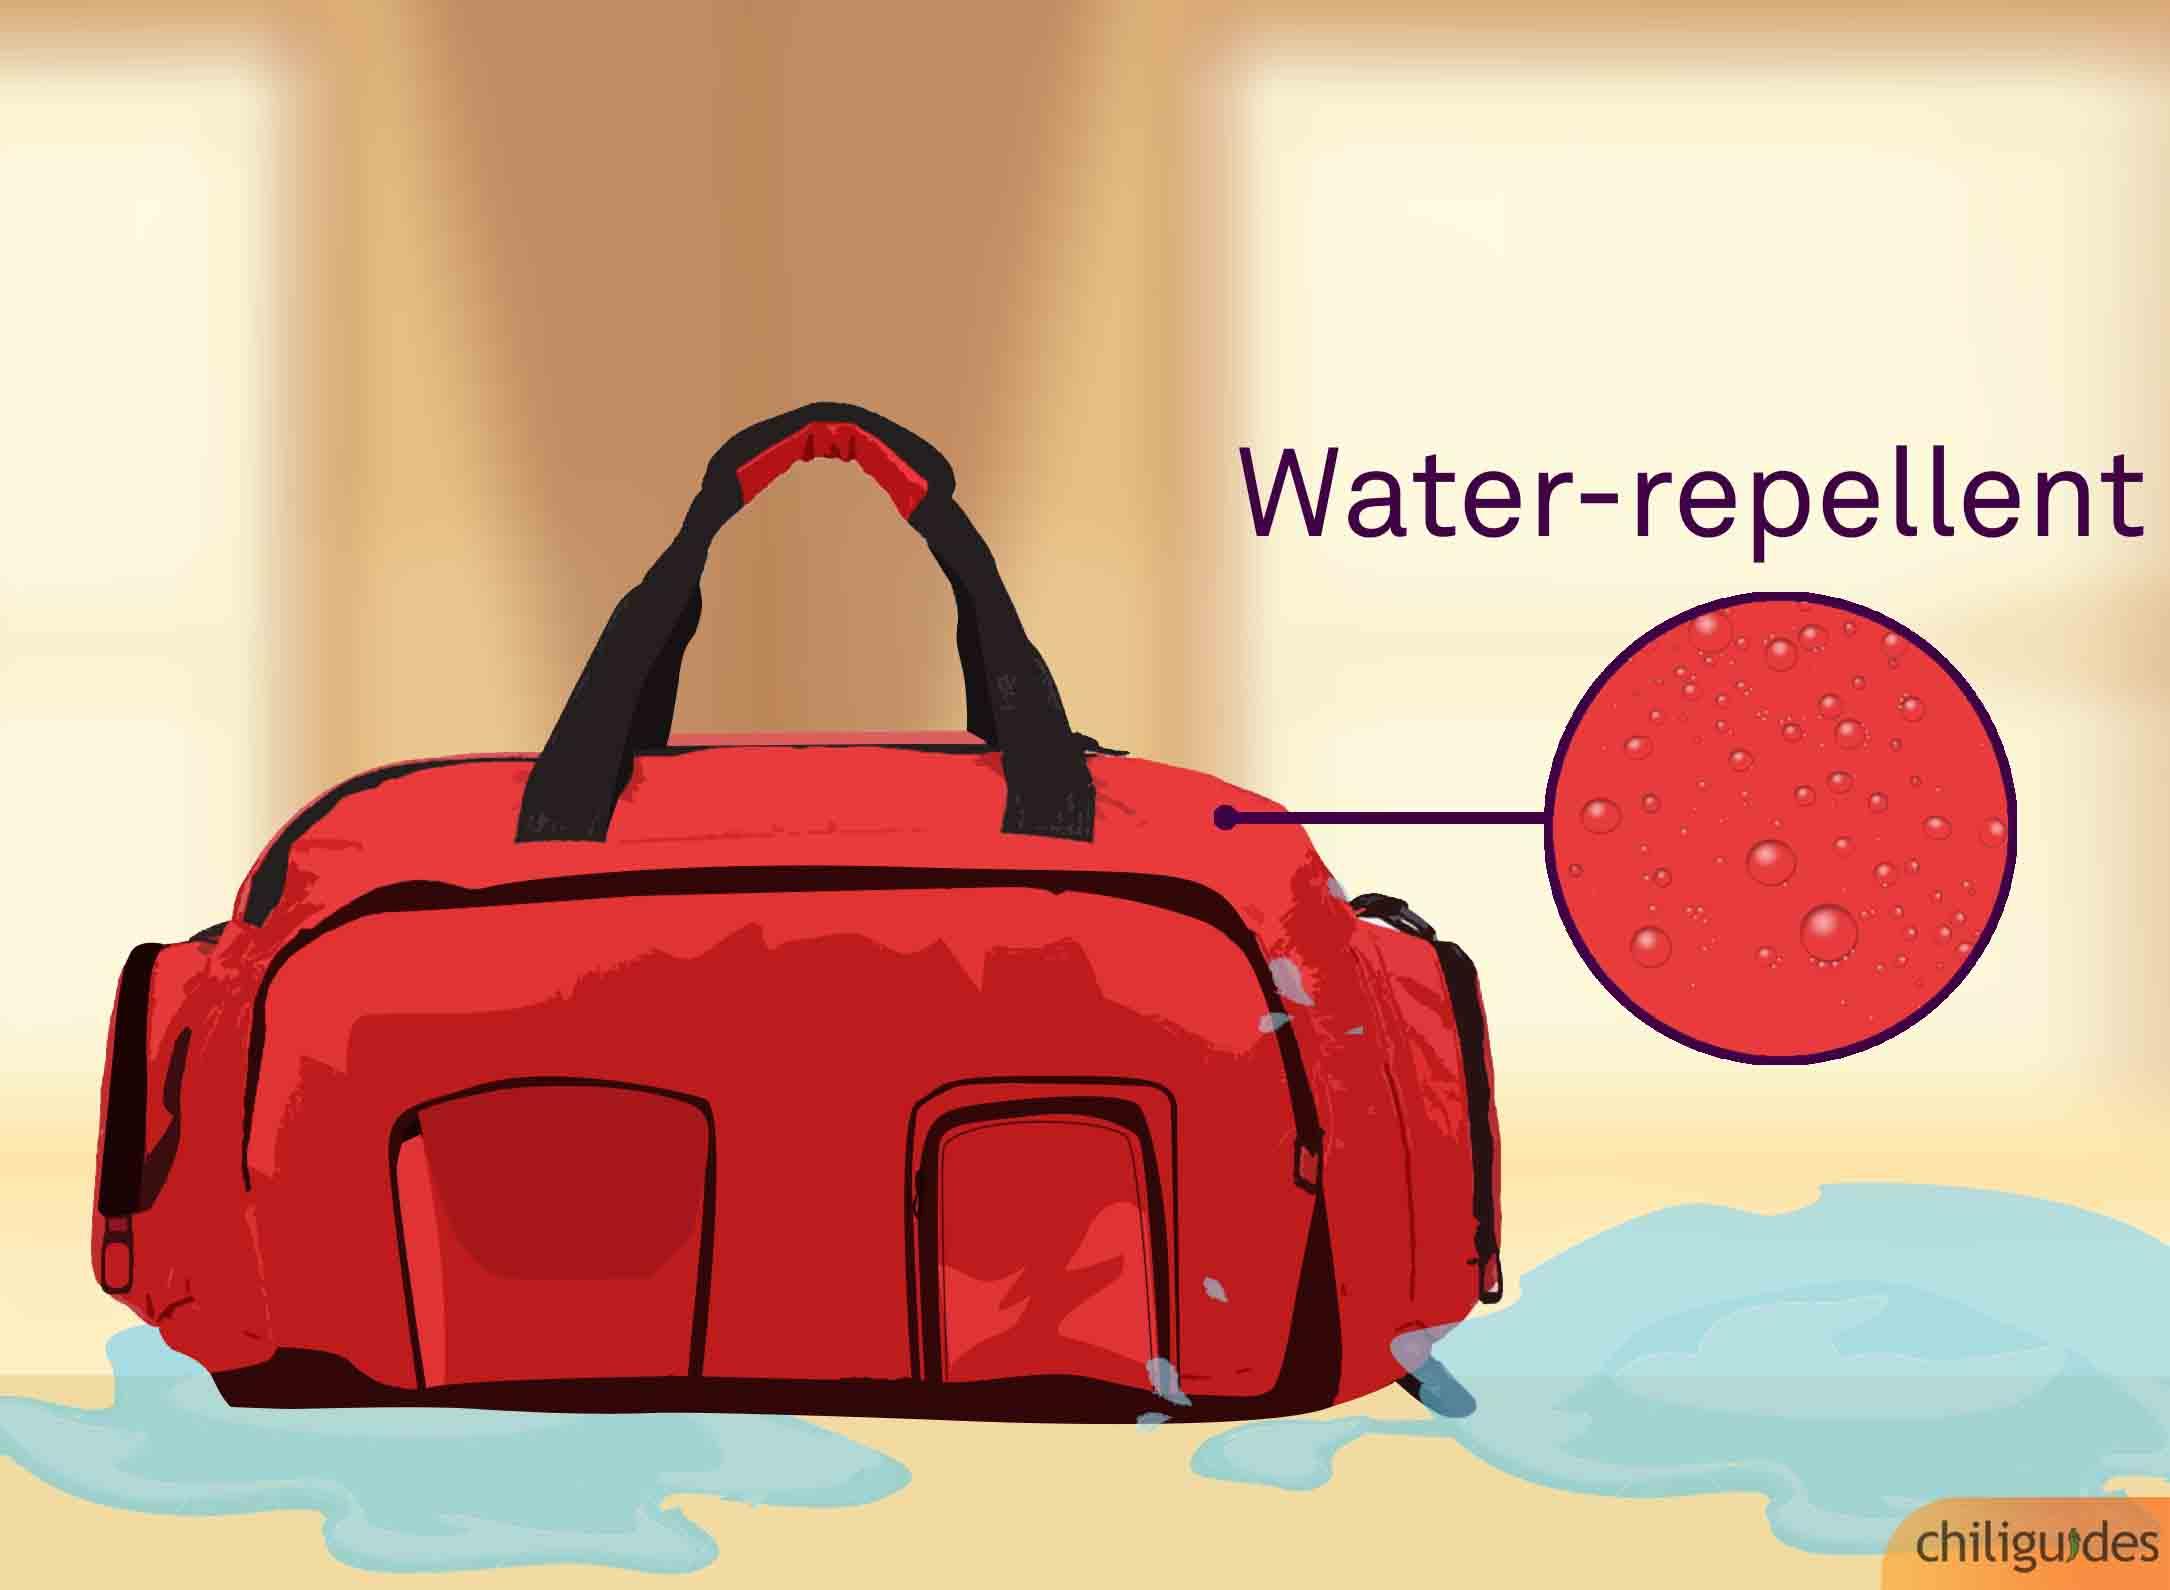 <p><b>The bag must be water-repellent.</b></p>